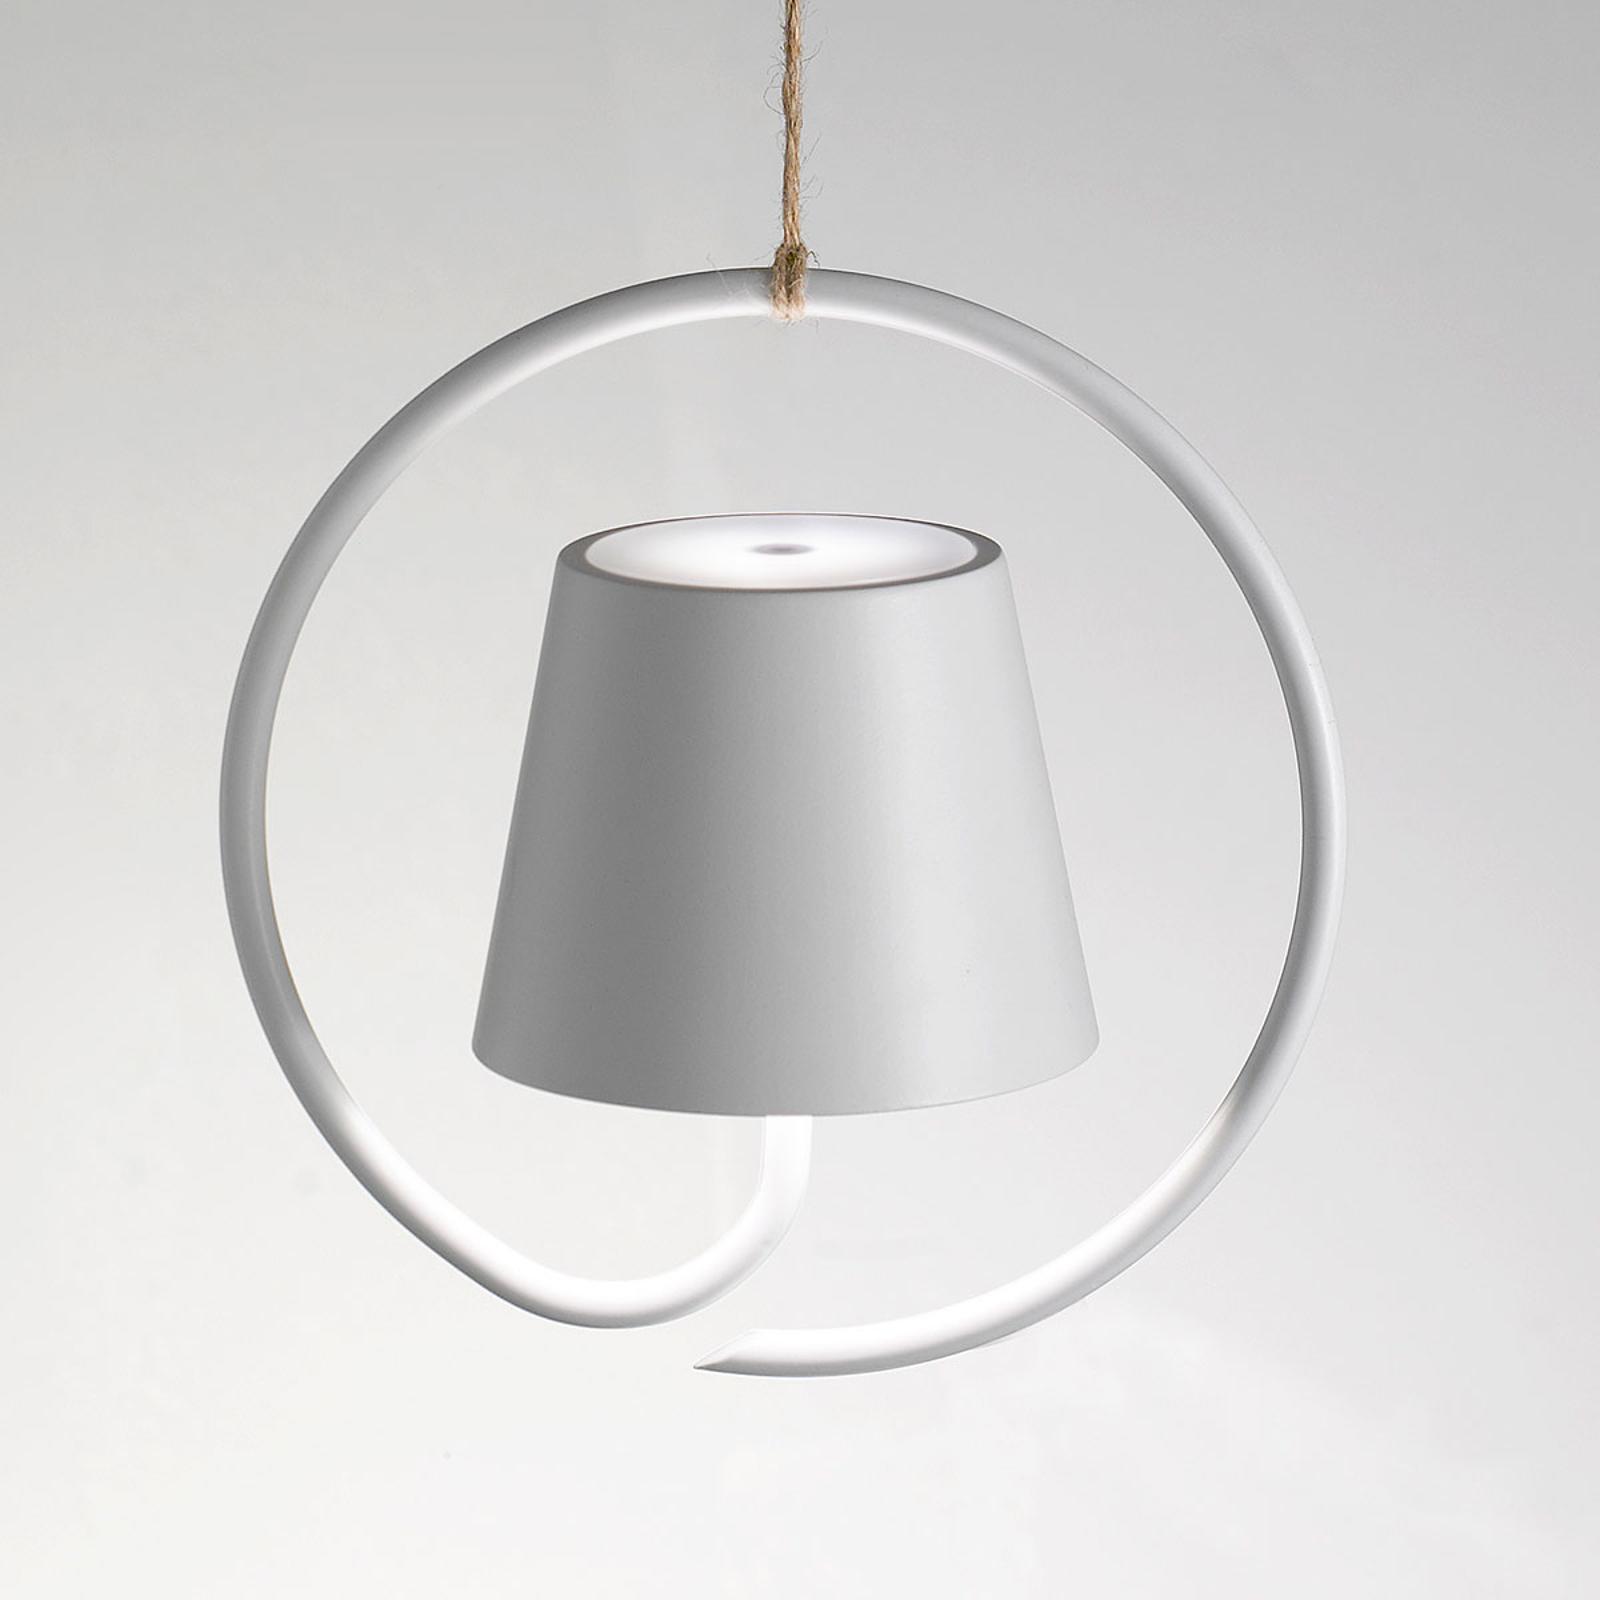 LED-hänglampa Poldina batteridriven, vit